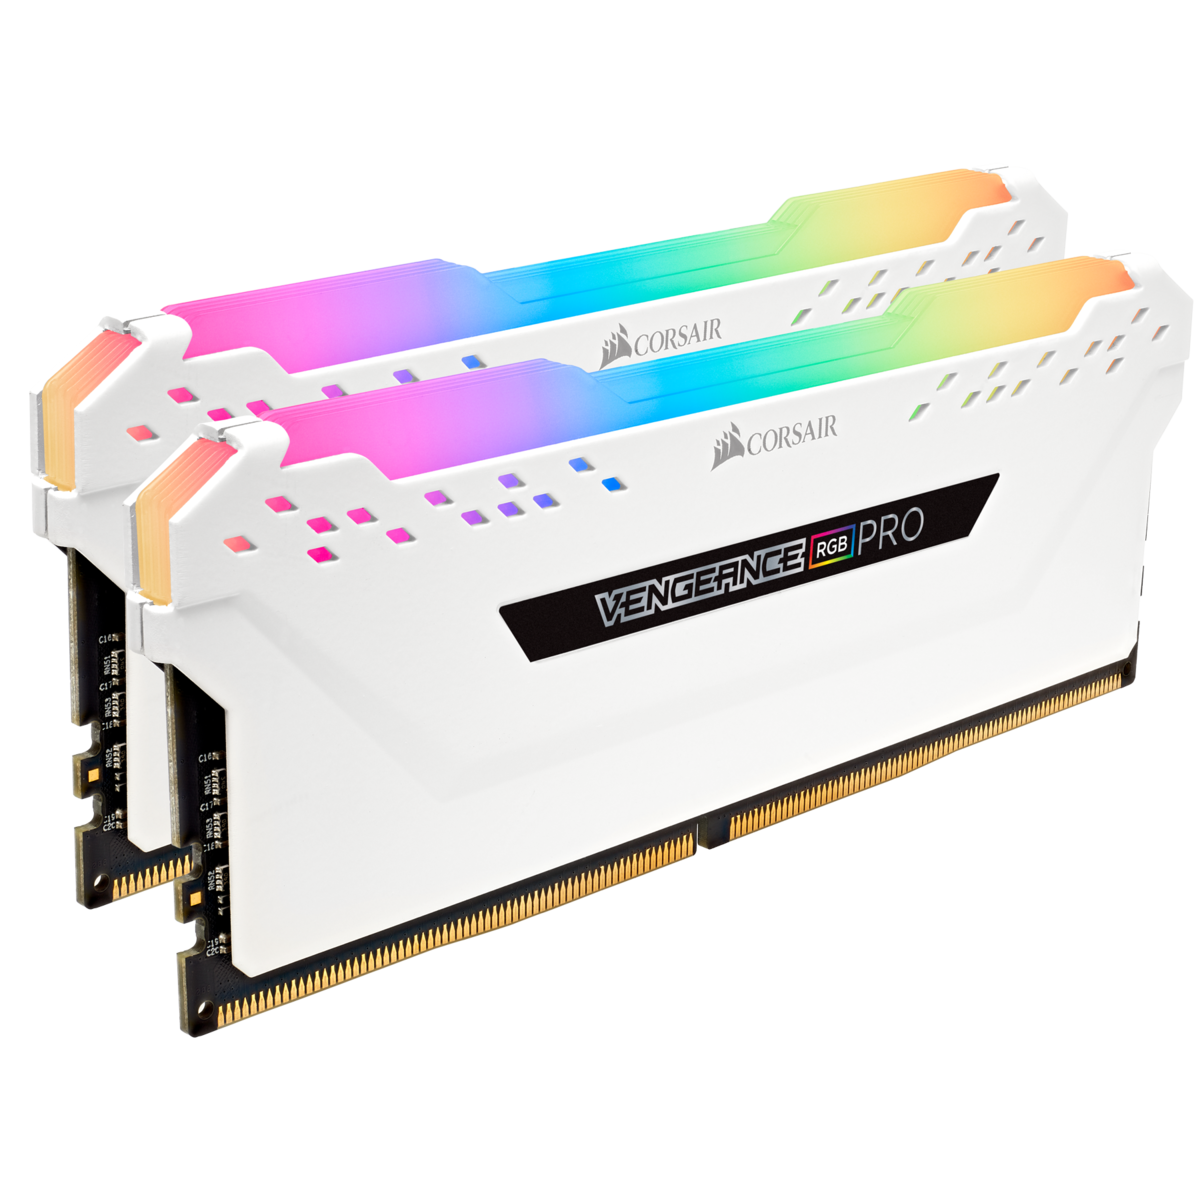 MEMORIA 16GB 2X8 3200MHZ VENGEANCE PRO WHITE CORSAIR